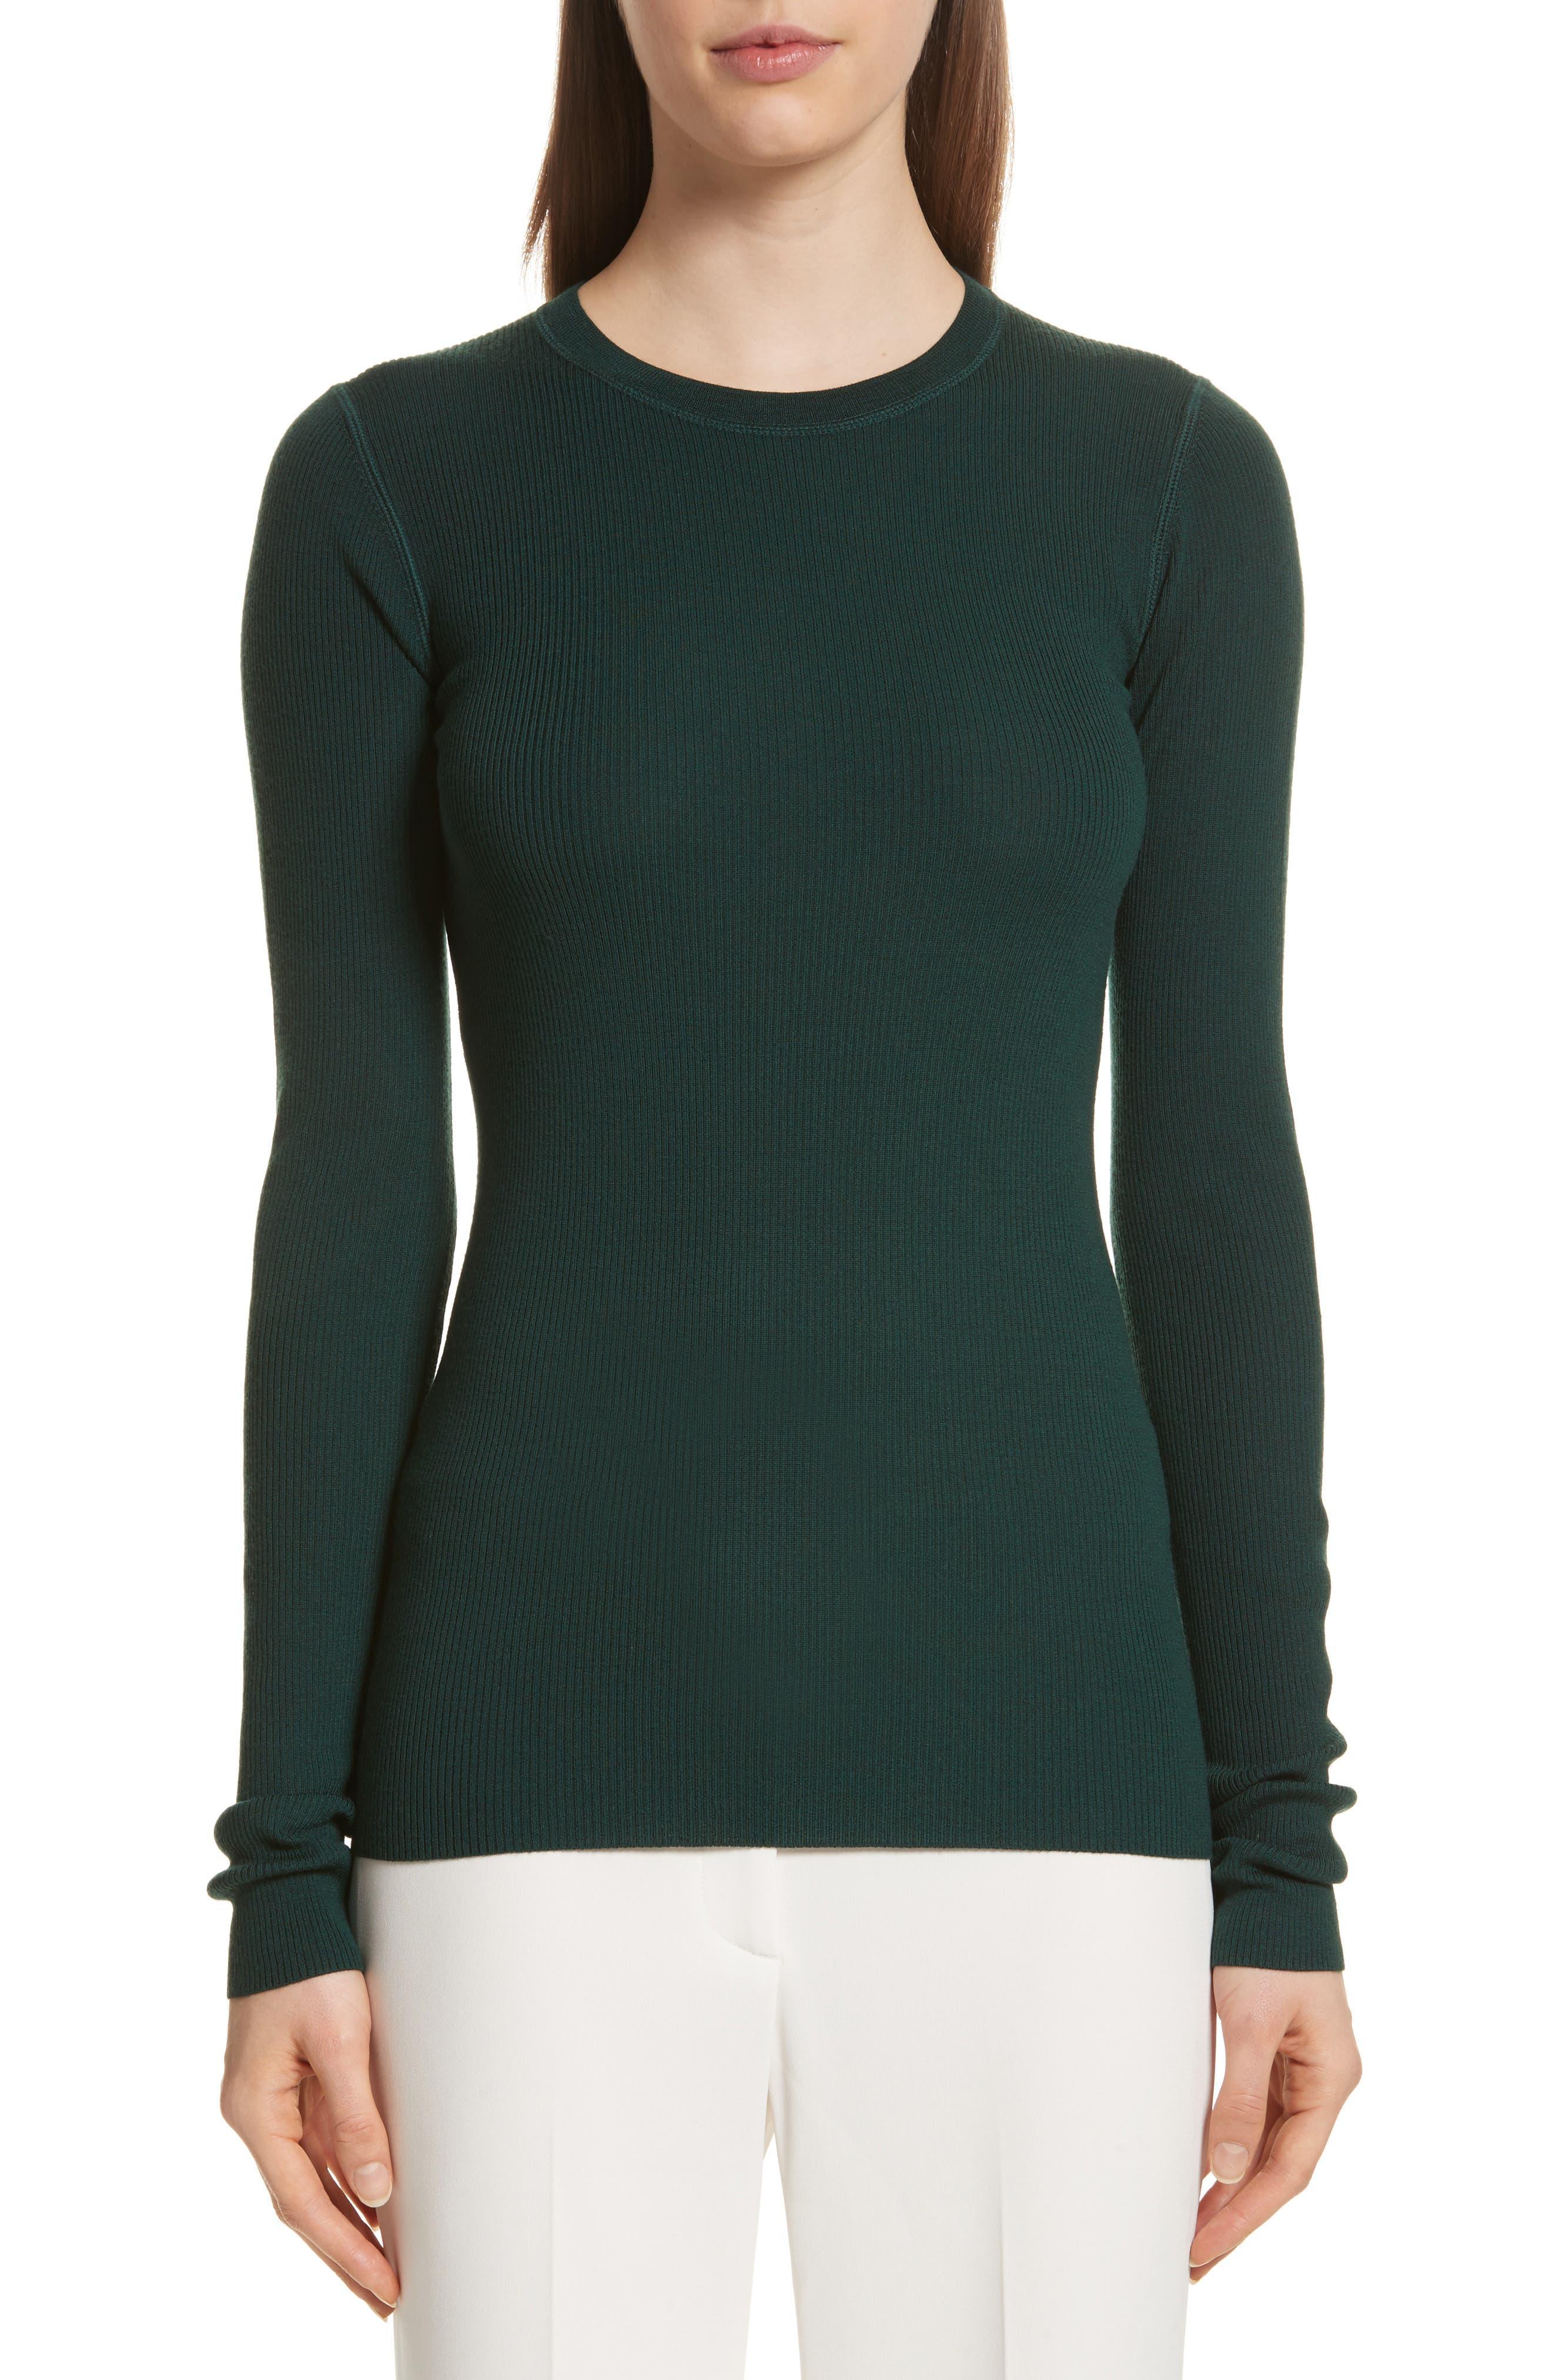 Mirzi Ribbed Sweater,                         Main,                         color, 308